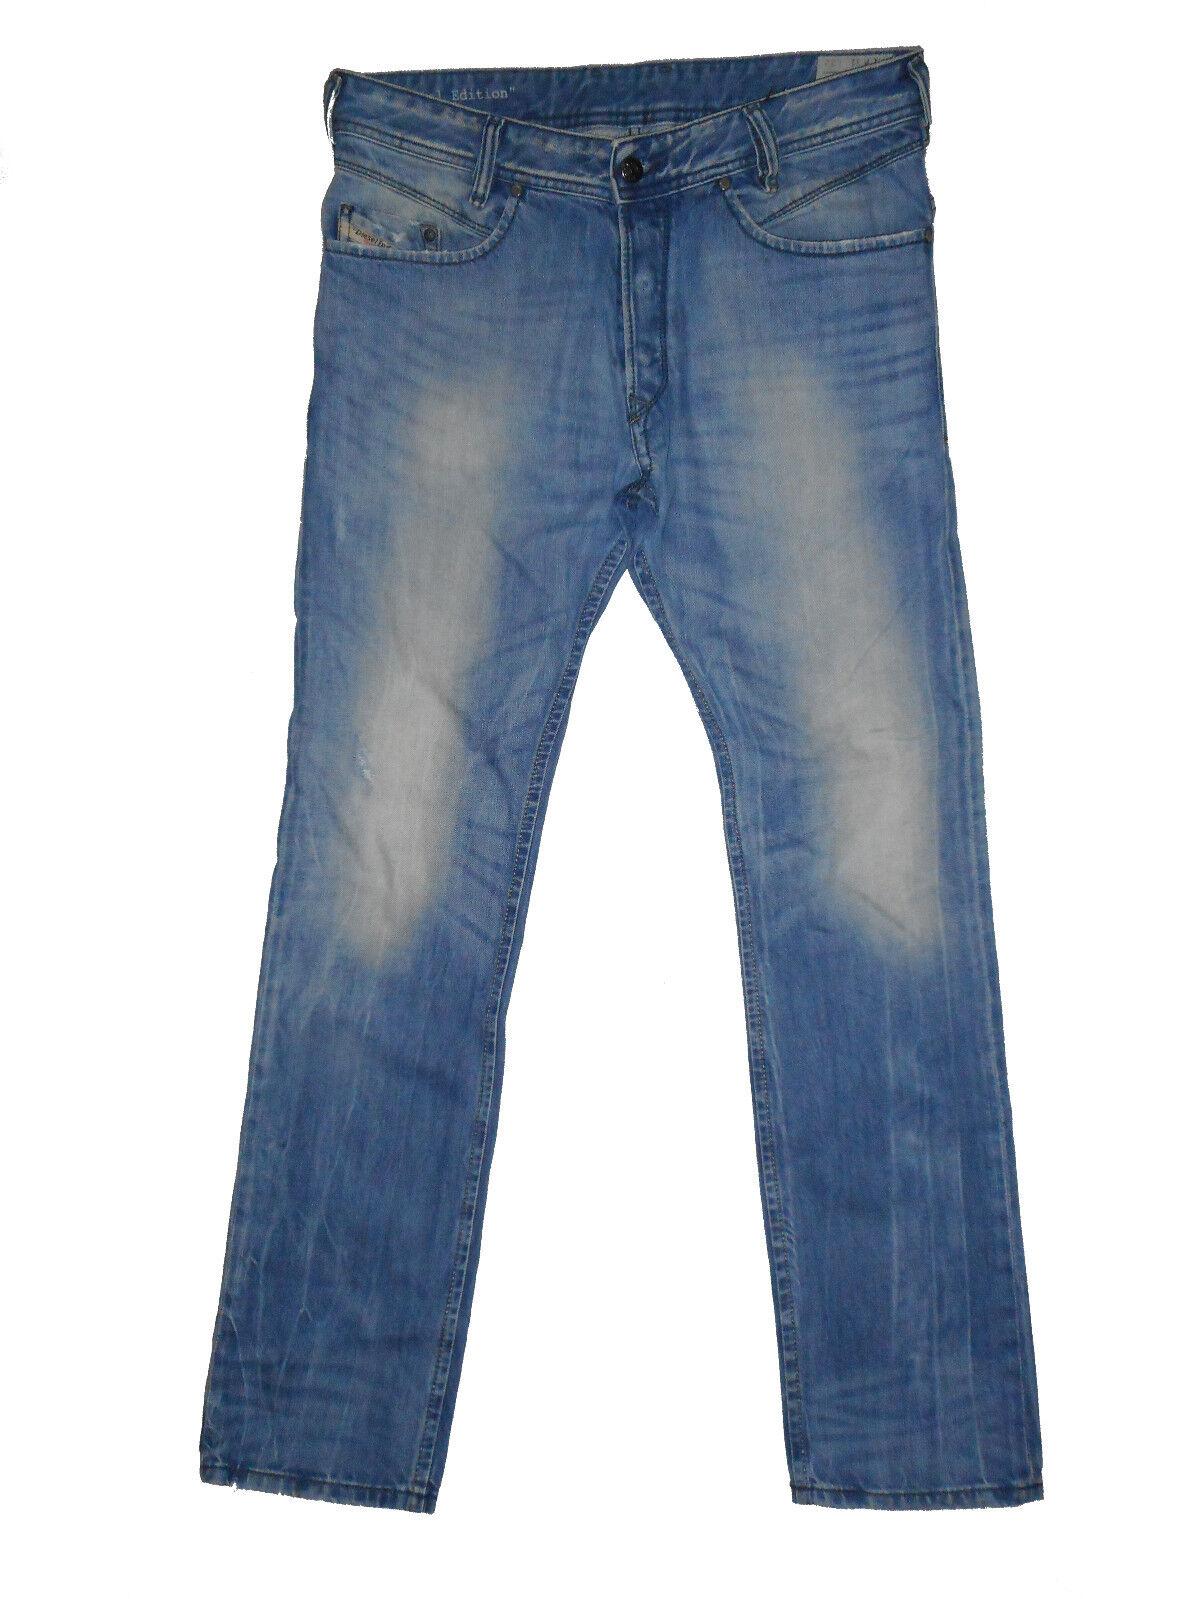 Special Edition Diesel POIAK 0816P Slim Tapered W31 L32 Mens bluee Denim Jeans